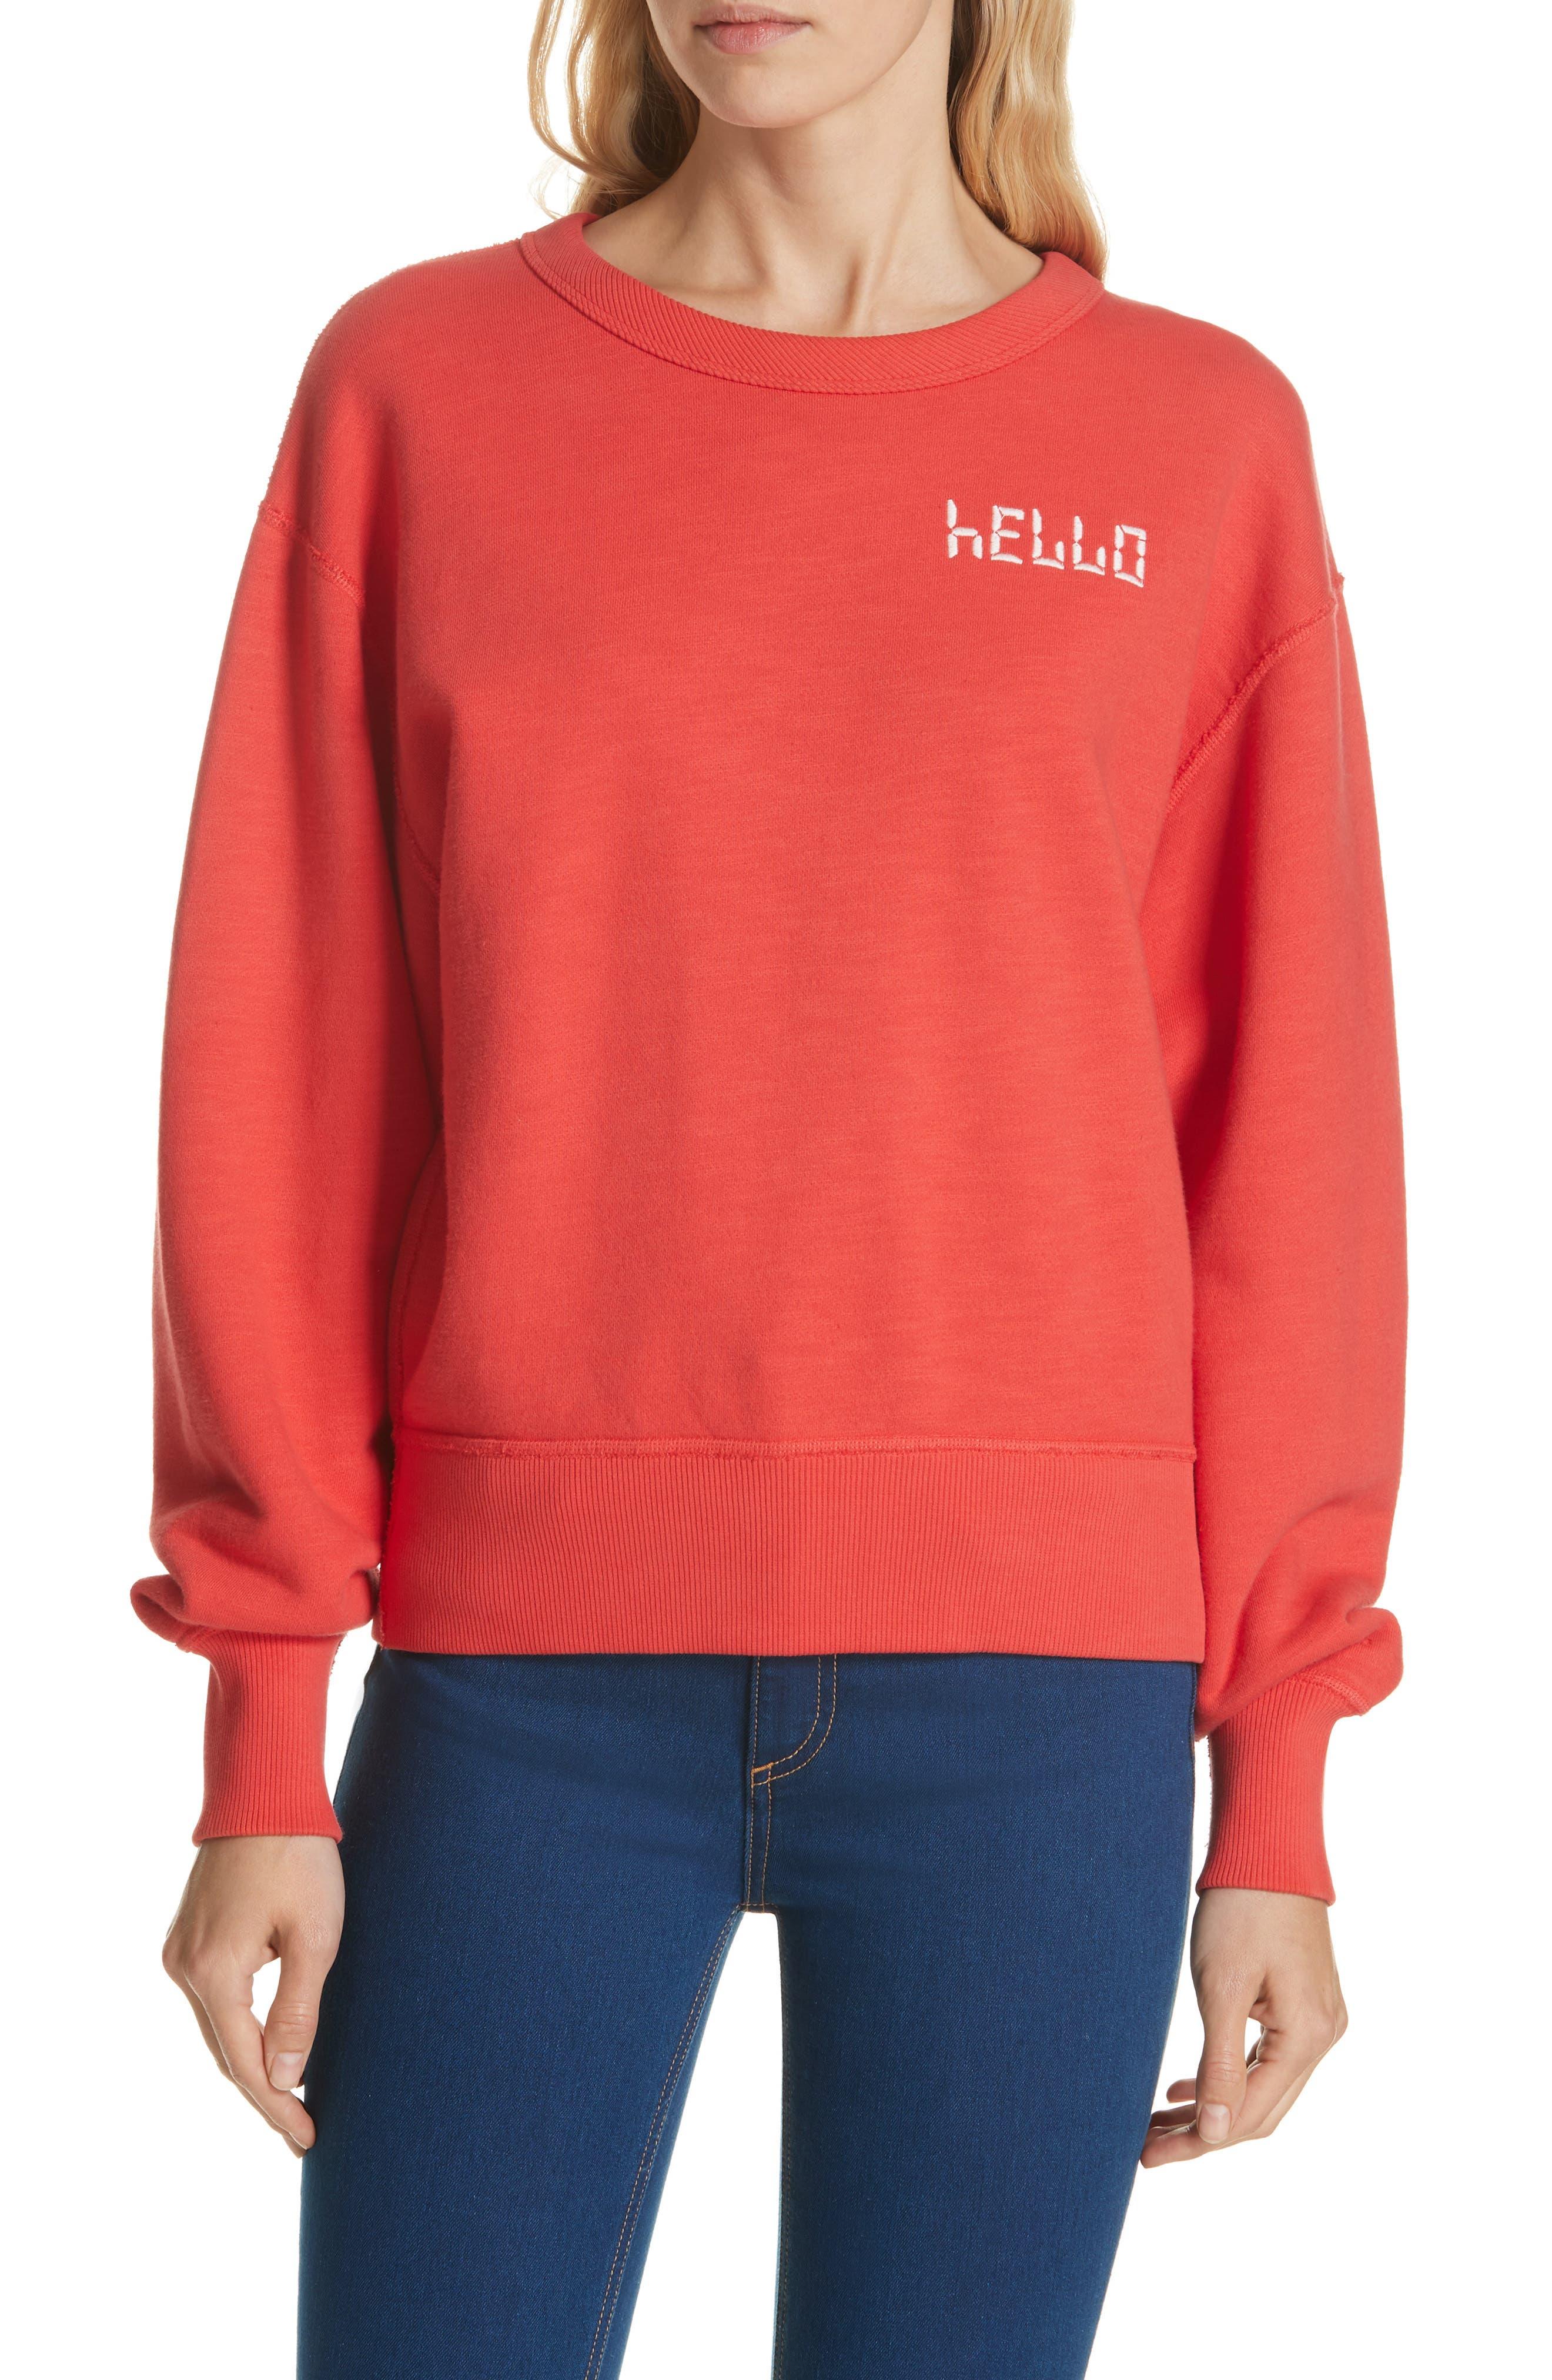 Hello Sweatshirt,                         Main,                         color, CANDY APPLE